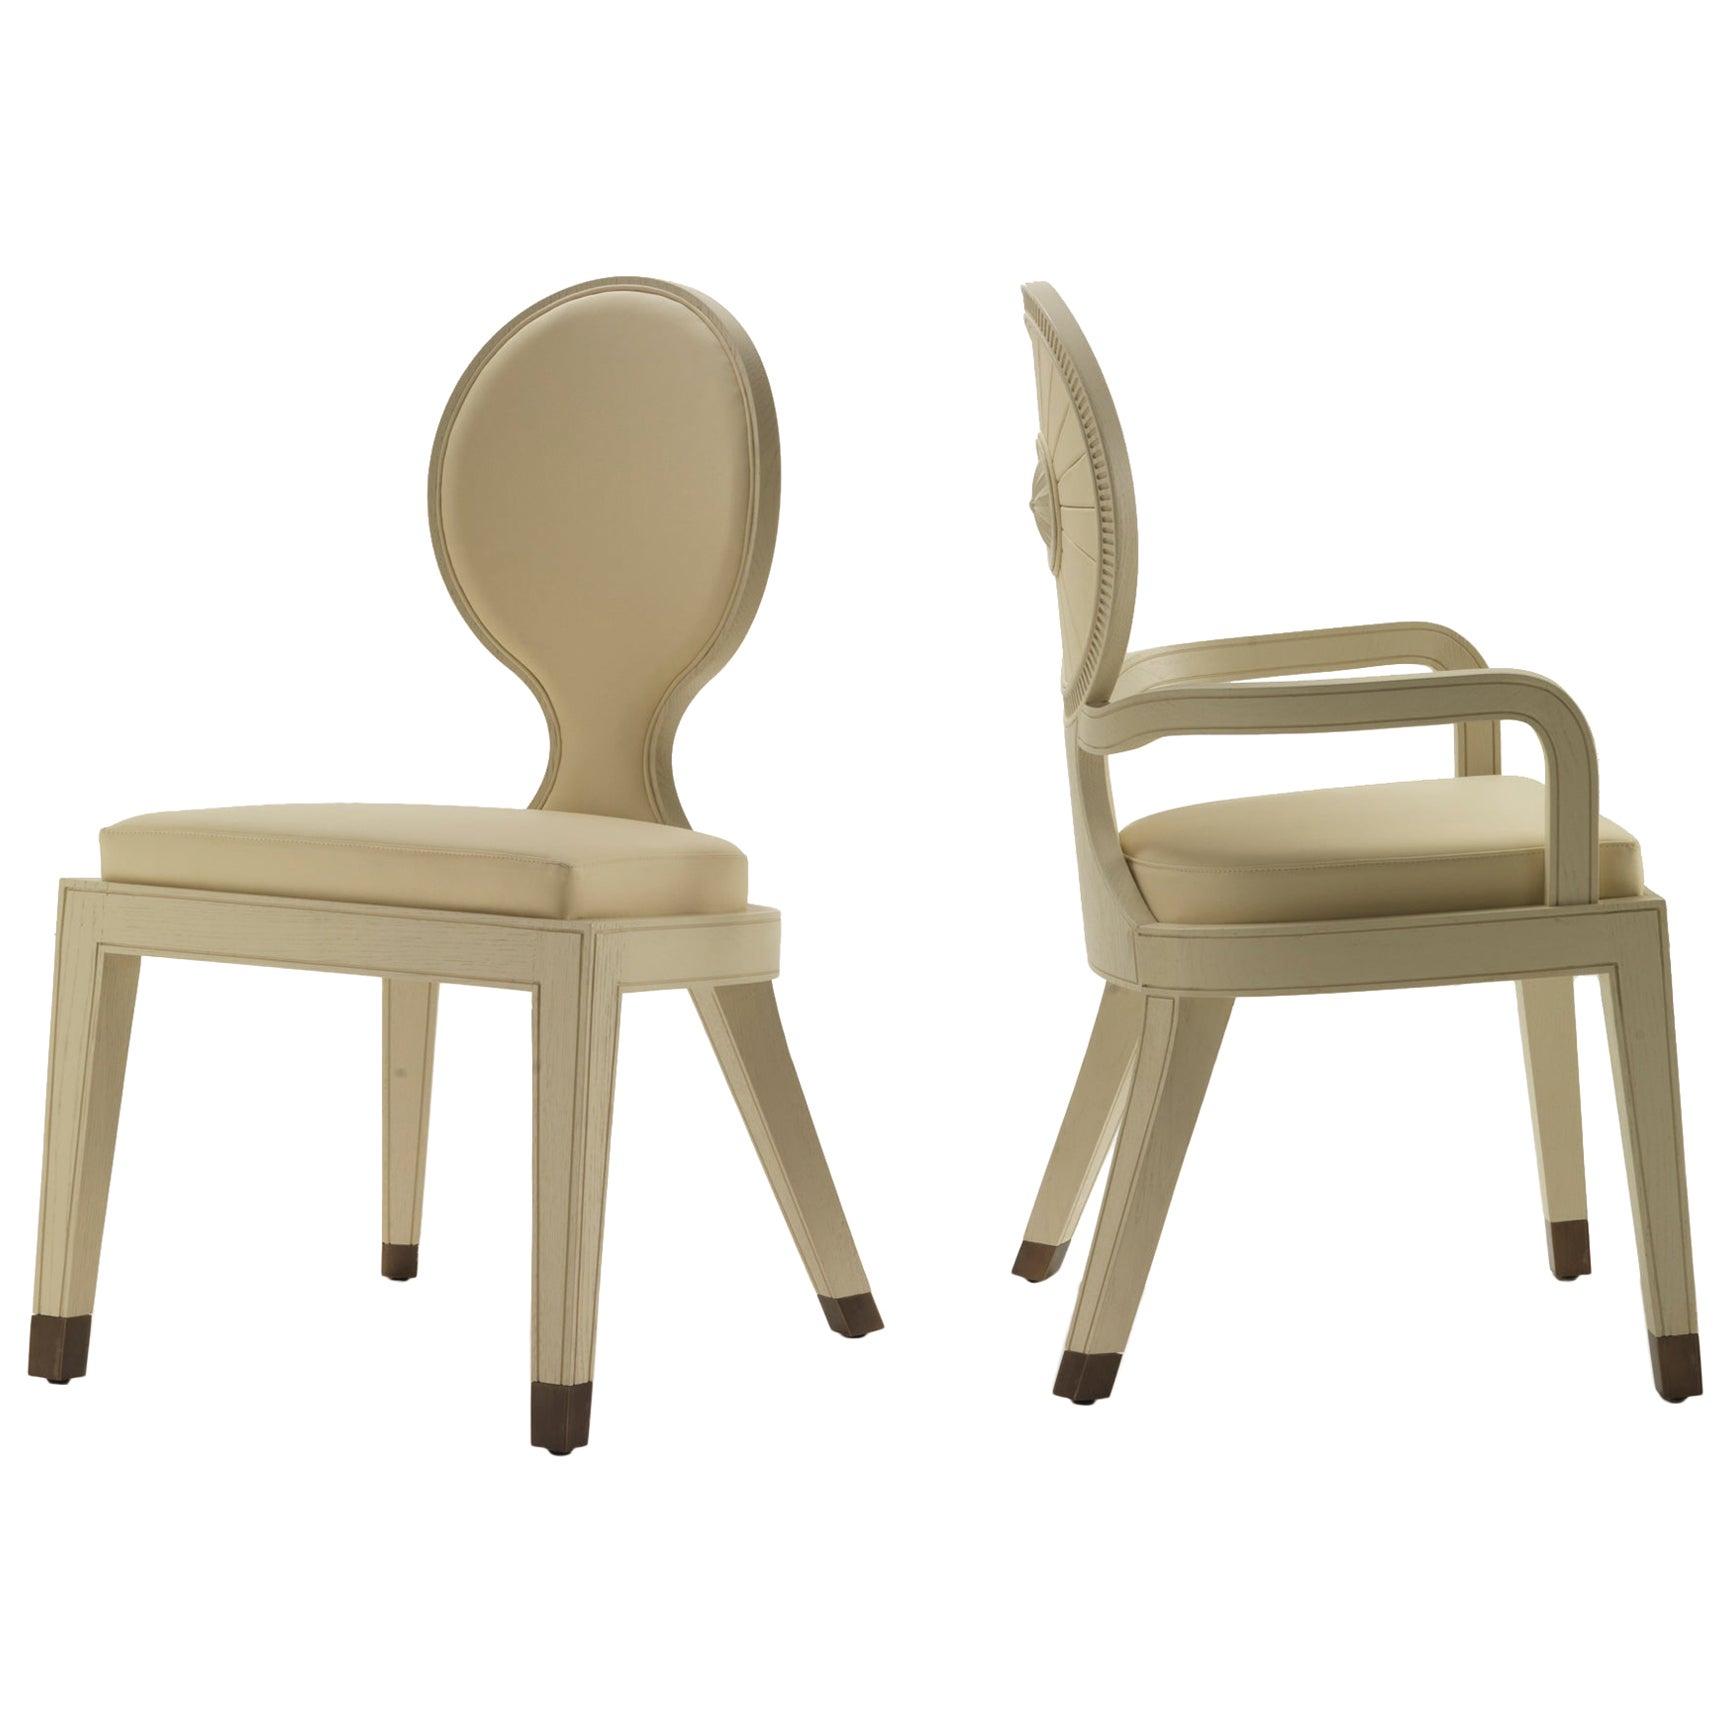 Moon & Sun Dining Chair in White Oak Finish